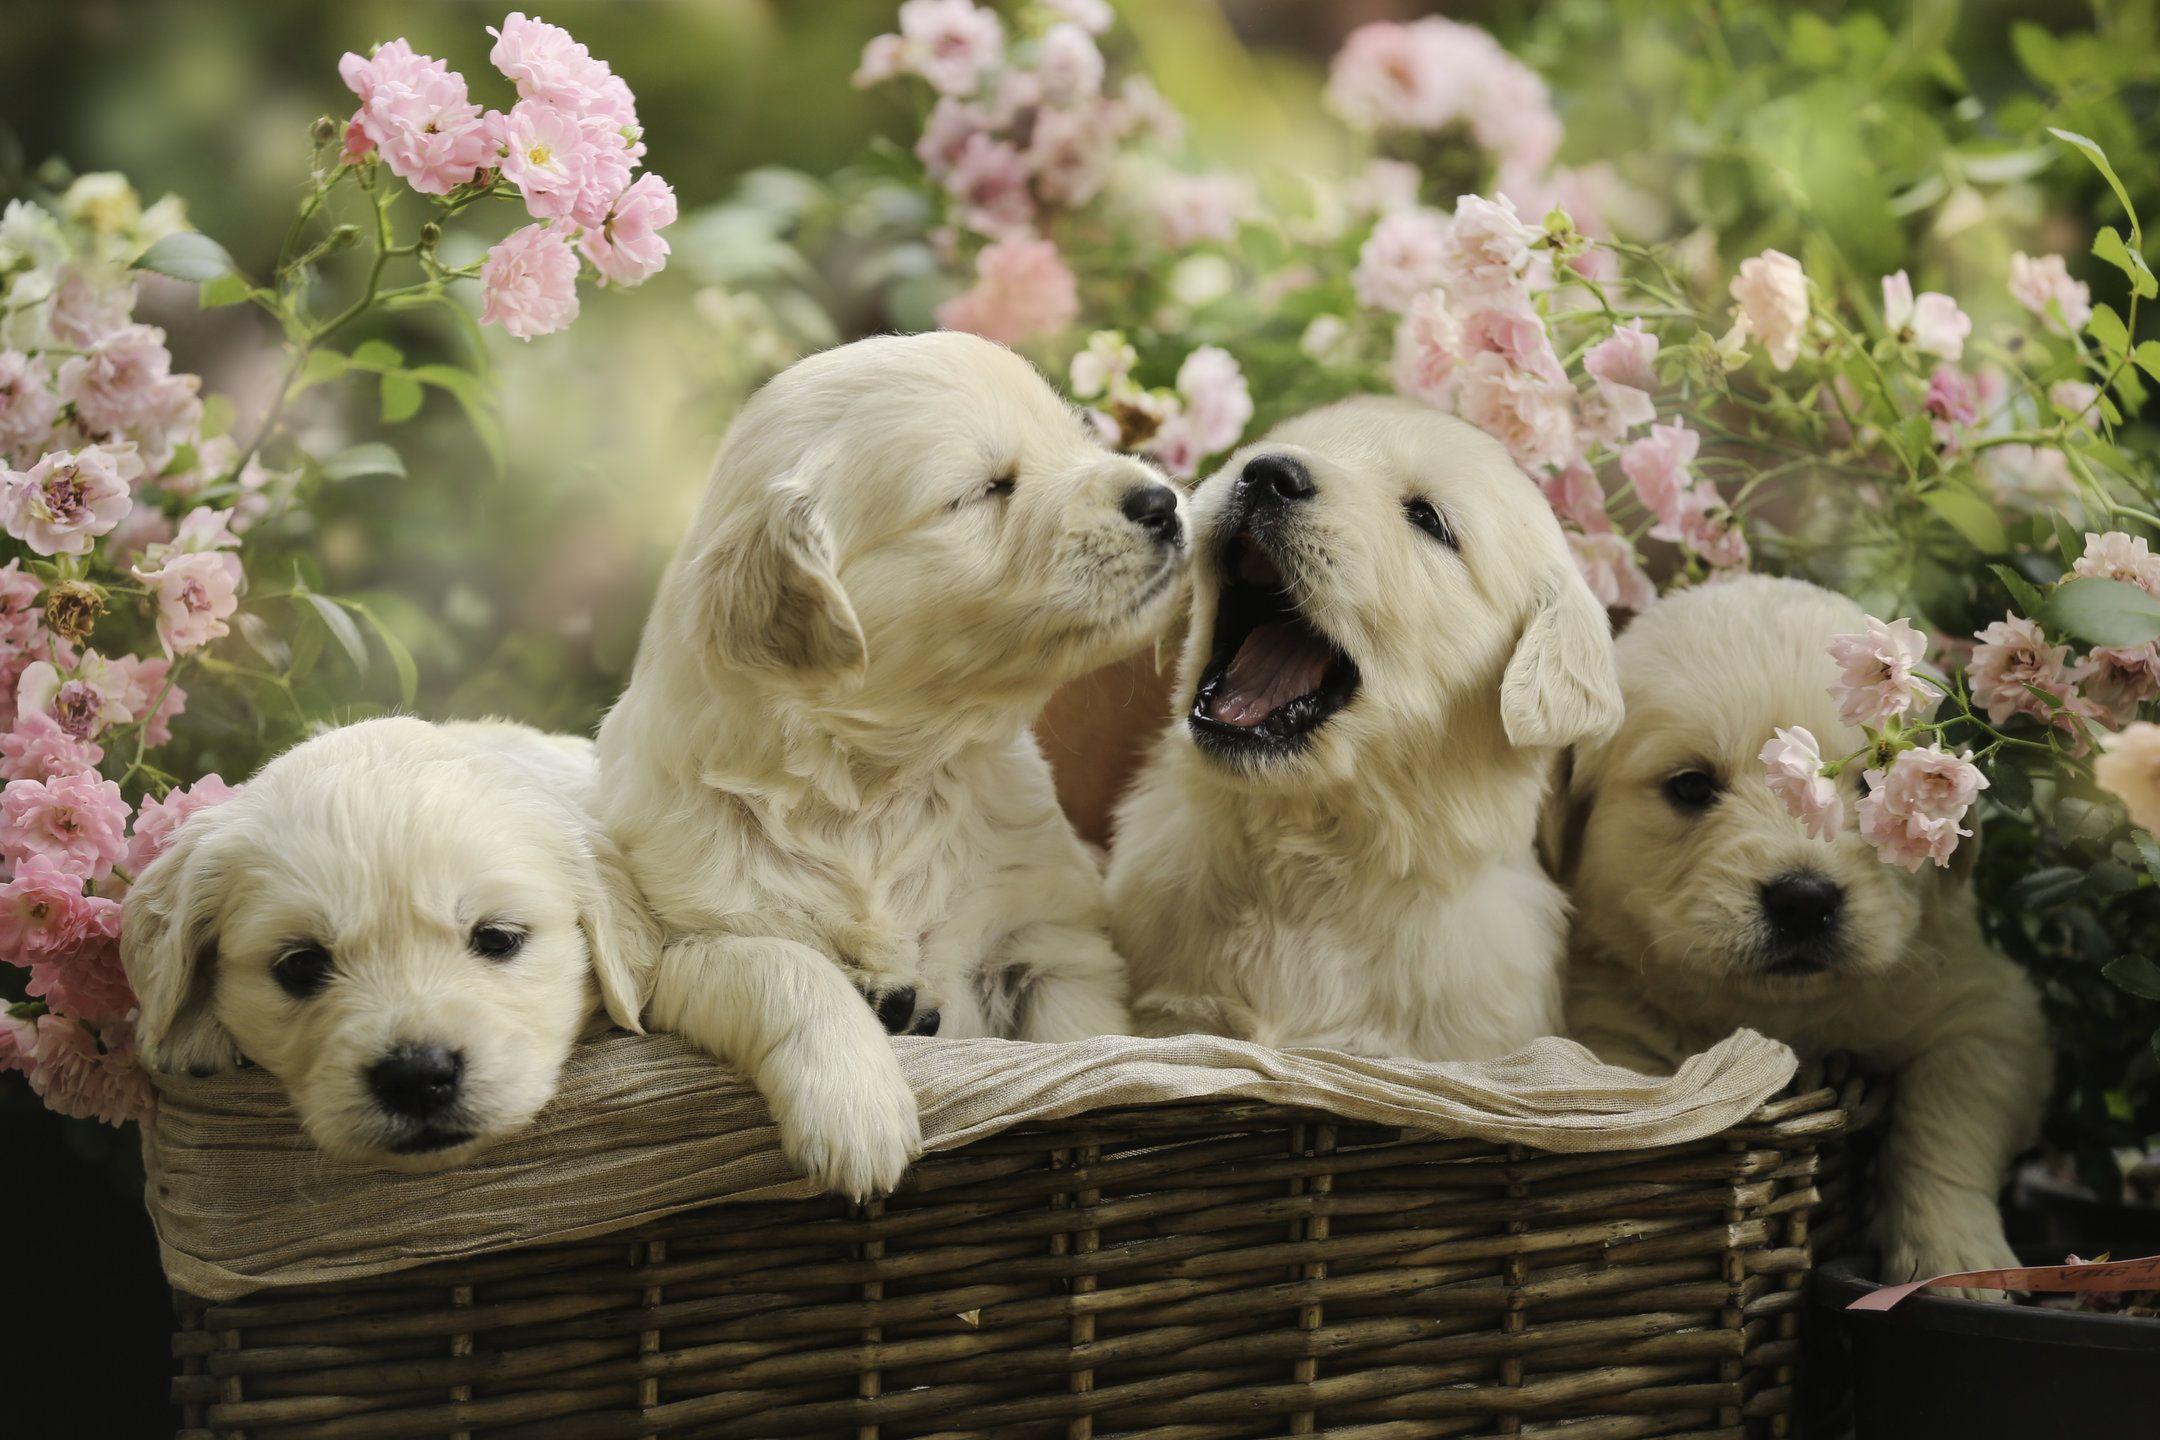 Little Golden Retriever Puppies In Summer Basket Puppies Labrador Retriever Puppies Greenfield Puppies